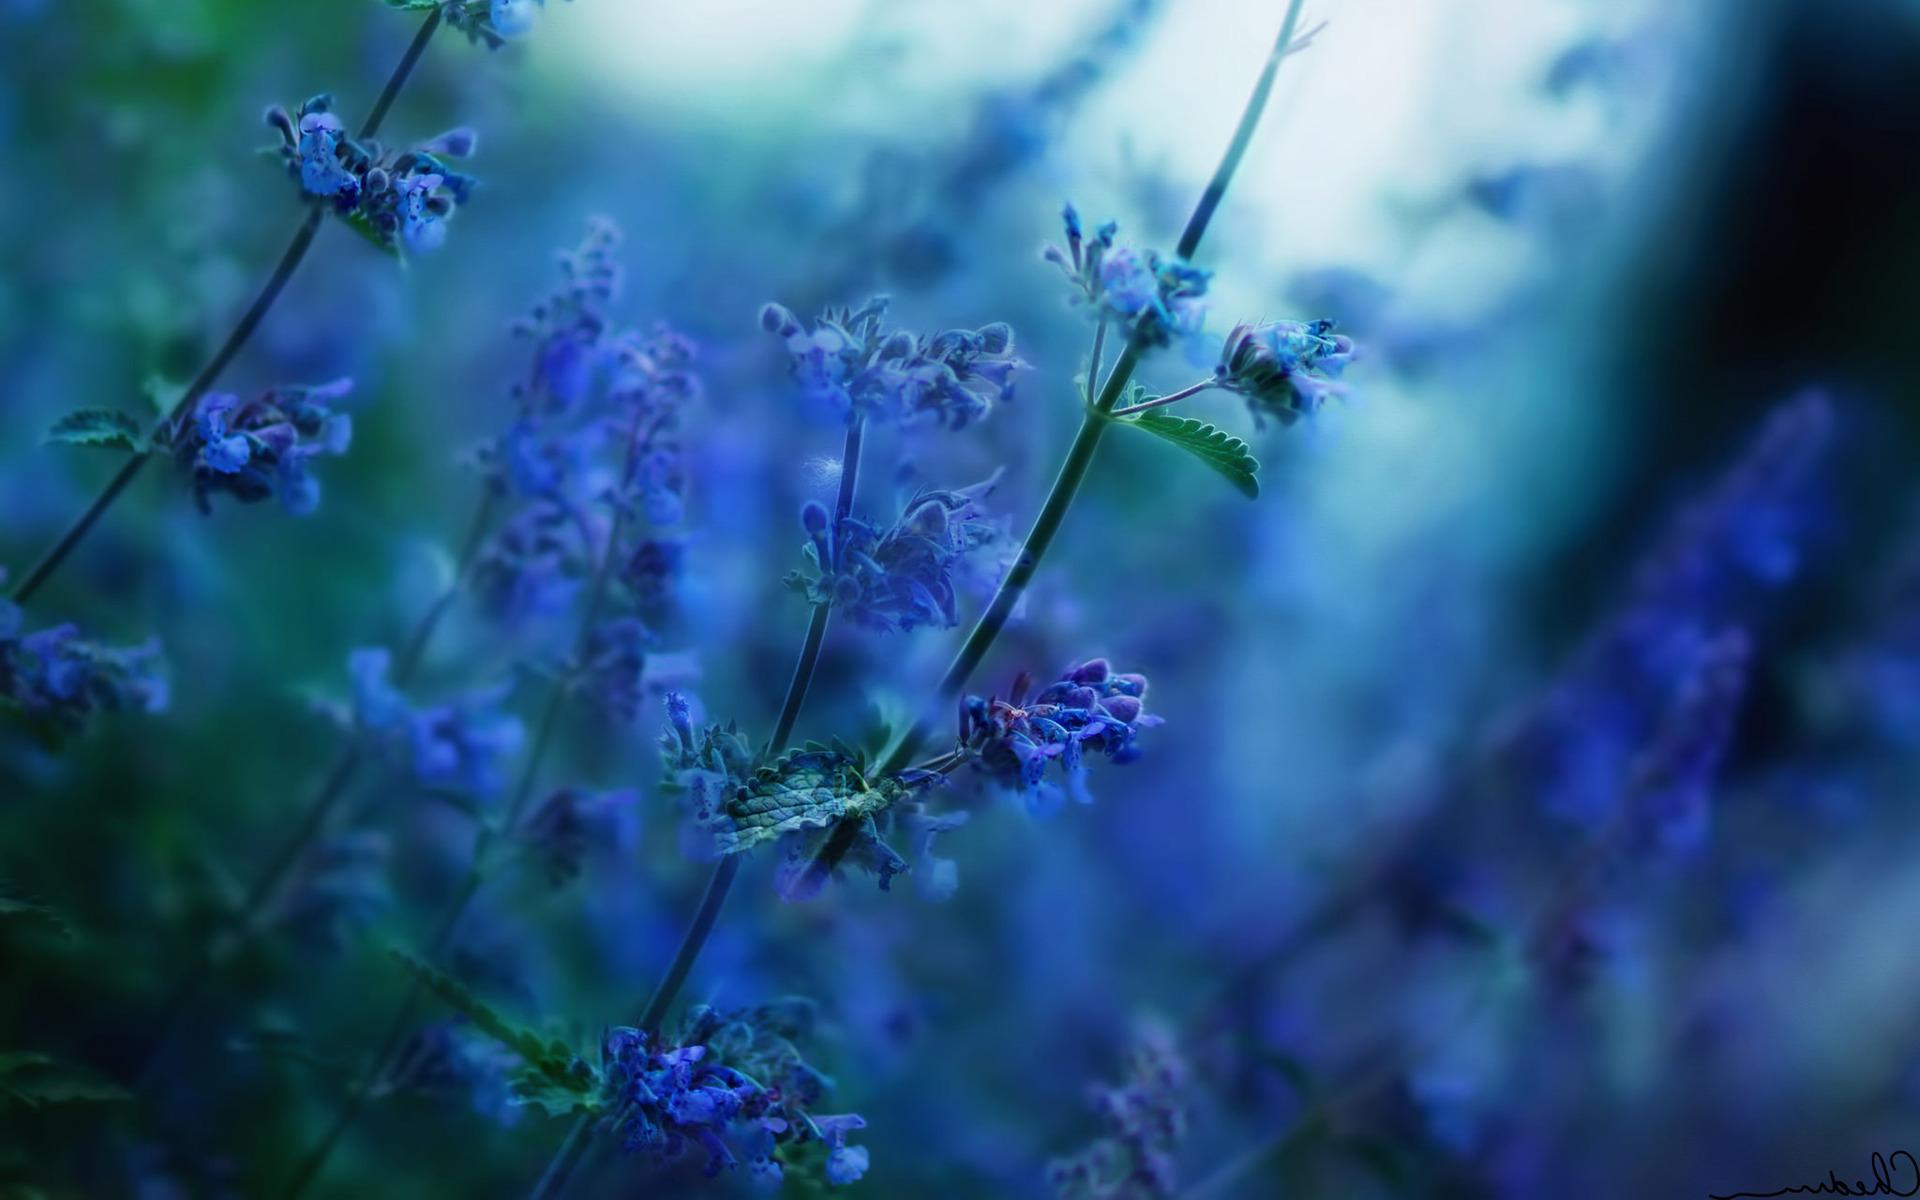 flowers, Nature, Depth Of Field, Sunlight, Blurred, Blue Flowers ...